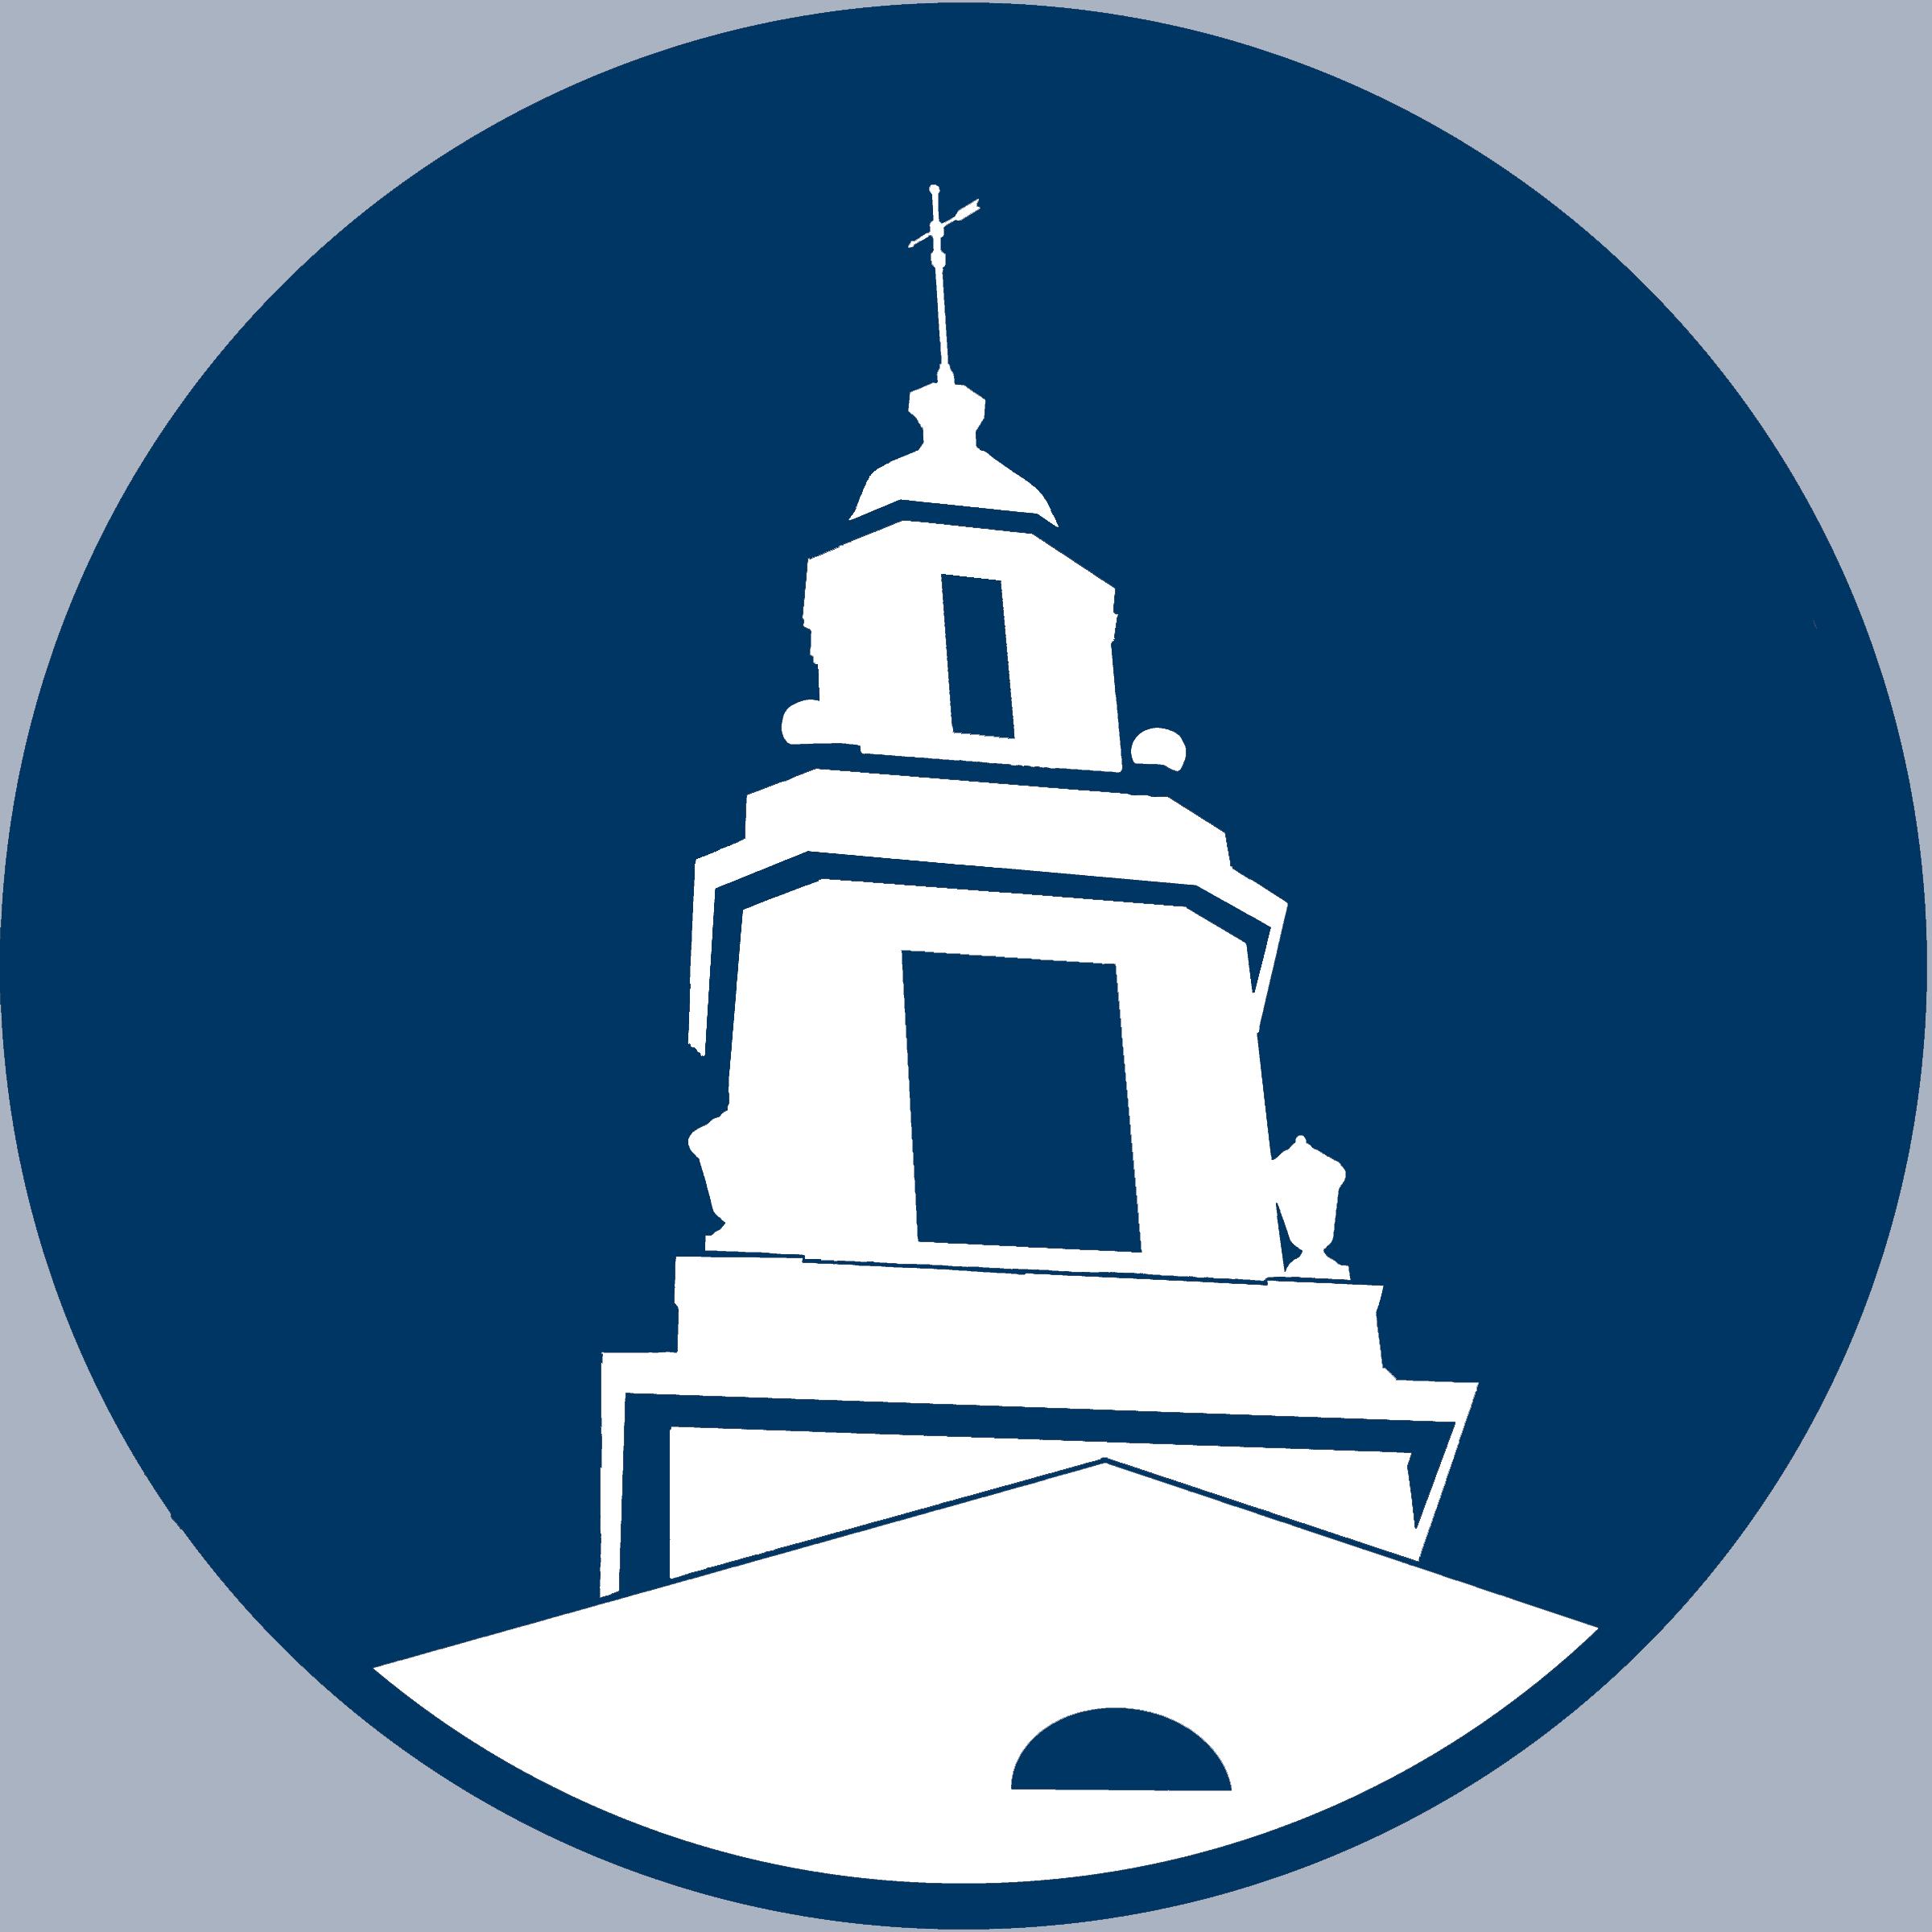 First Baptist Church of Kingsport